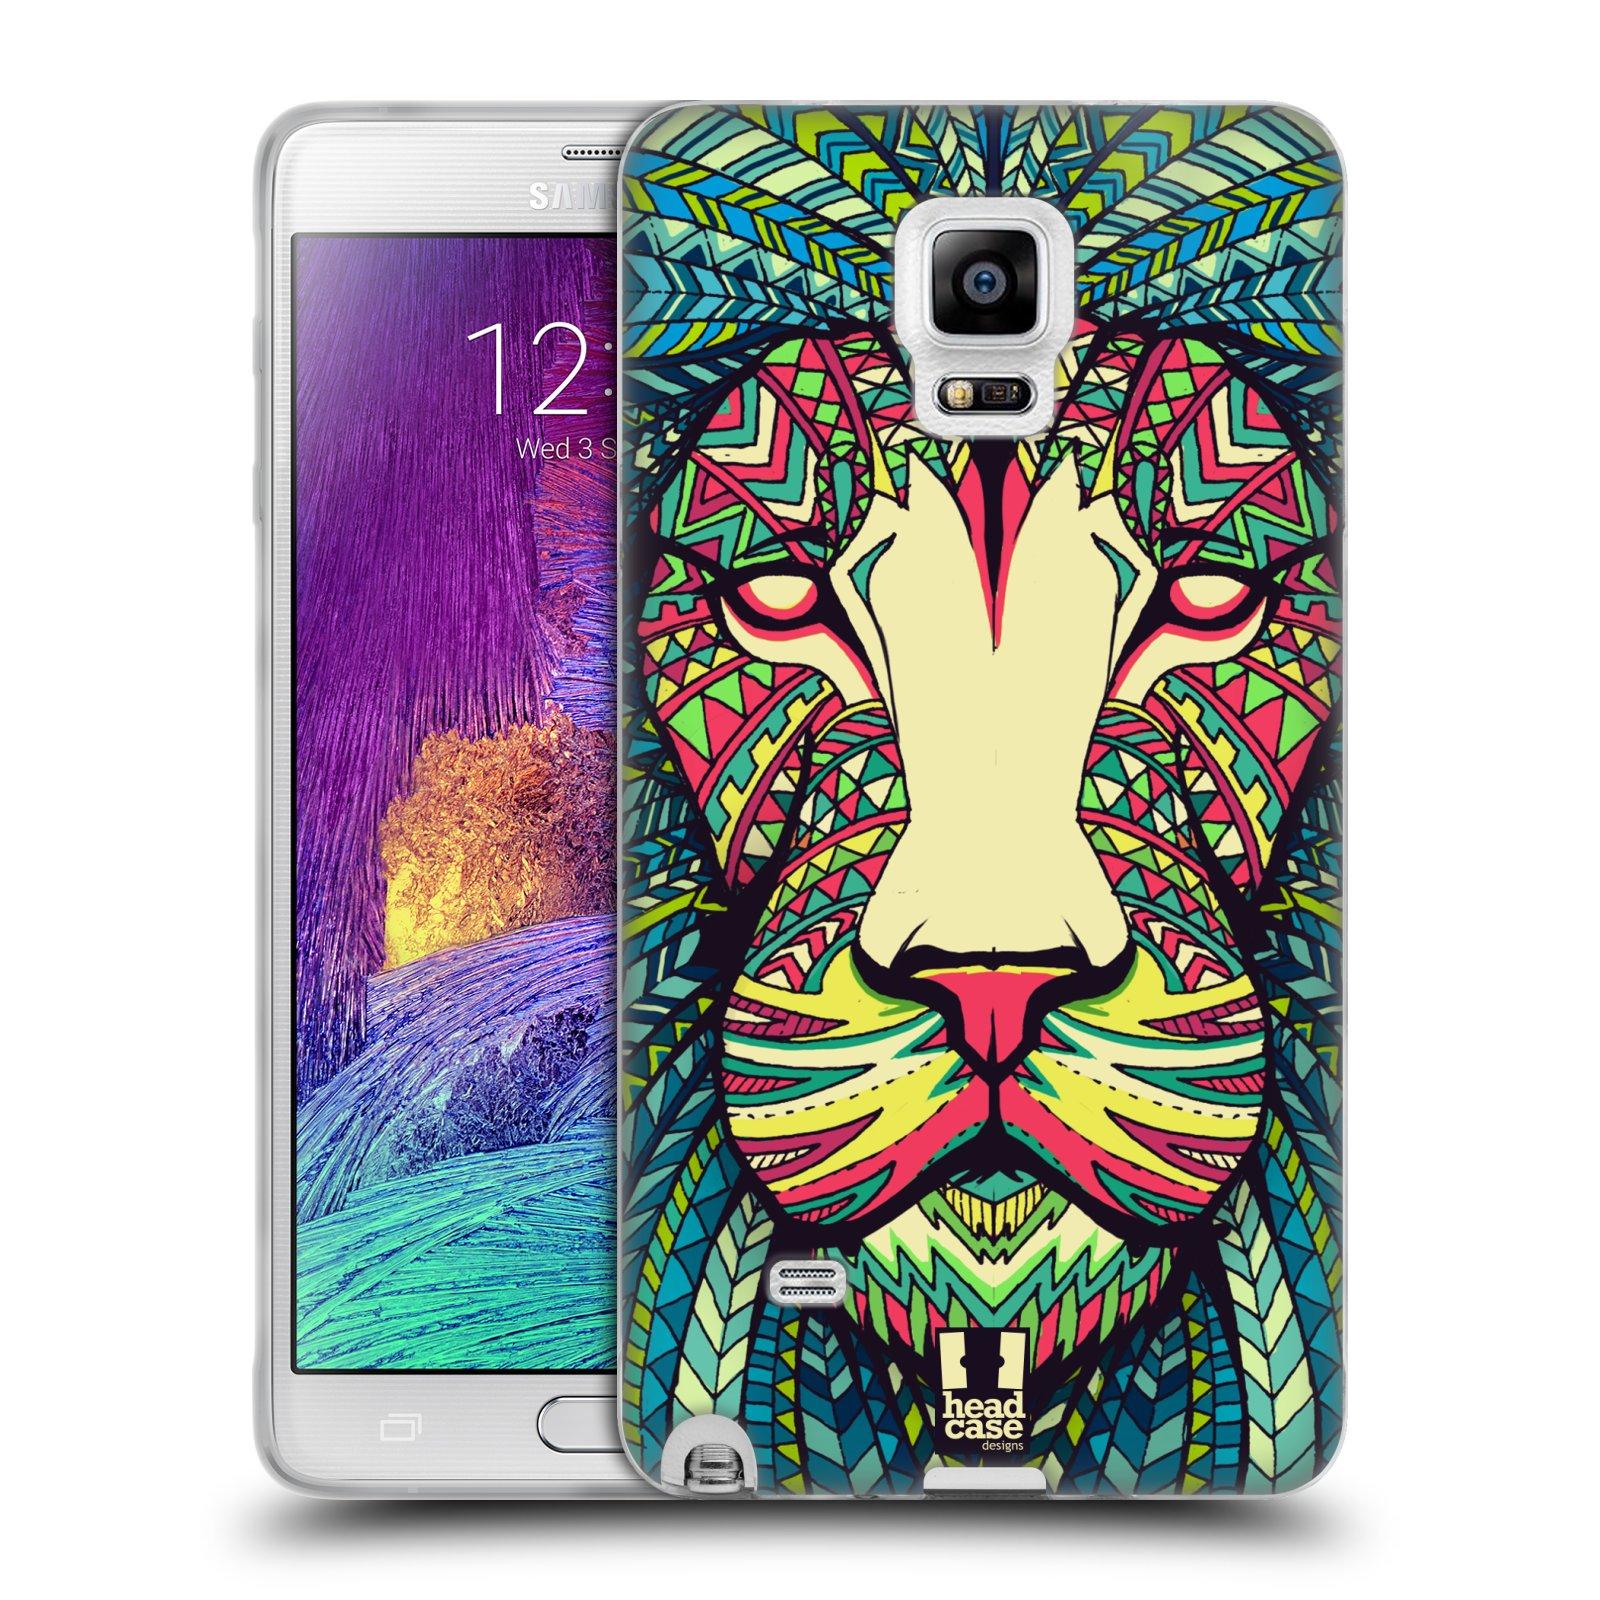 Silikonové pouzdro na mobil Samsung Galaxy Note 4 HEAD CASE AZTEC LEV (Silikonový kryt či obal na mobilní telefon Samsung Galaxy Note 4 SM-N910F)